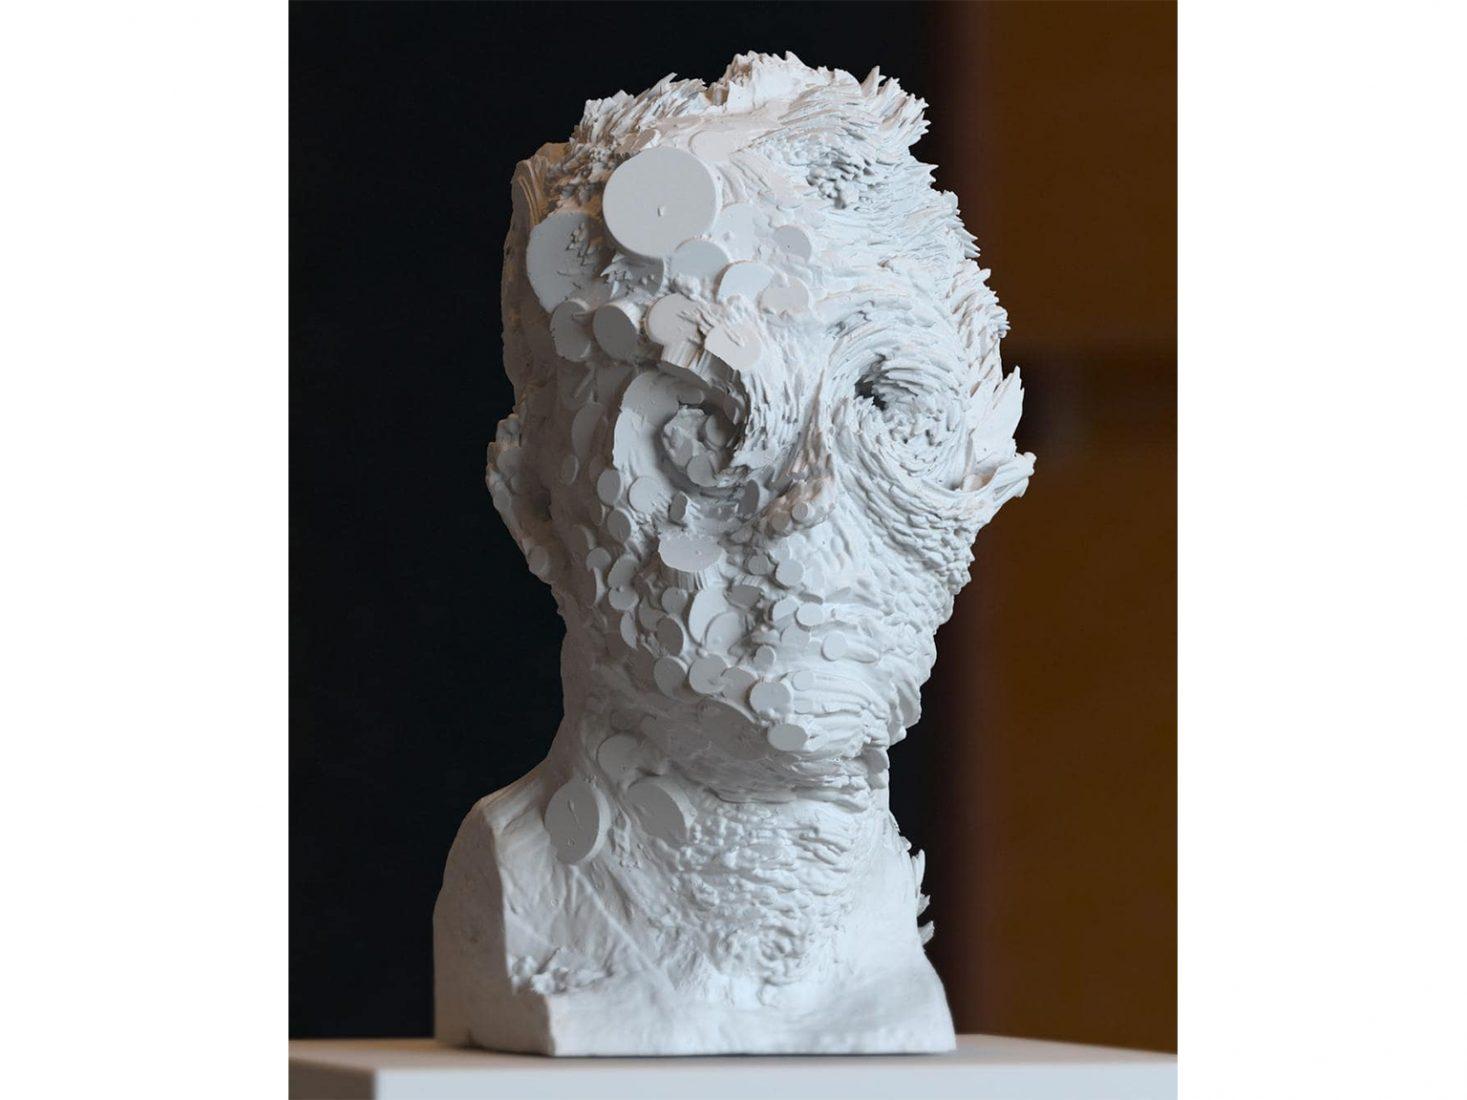 Nikolay Konstantinov. Apophis, 2017, plaster, 36 x 30 x 27 cm